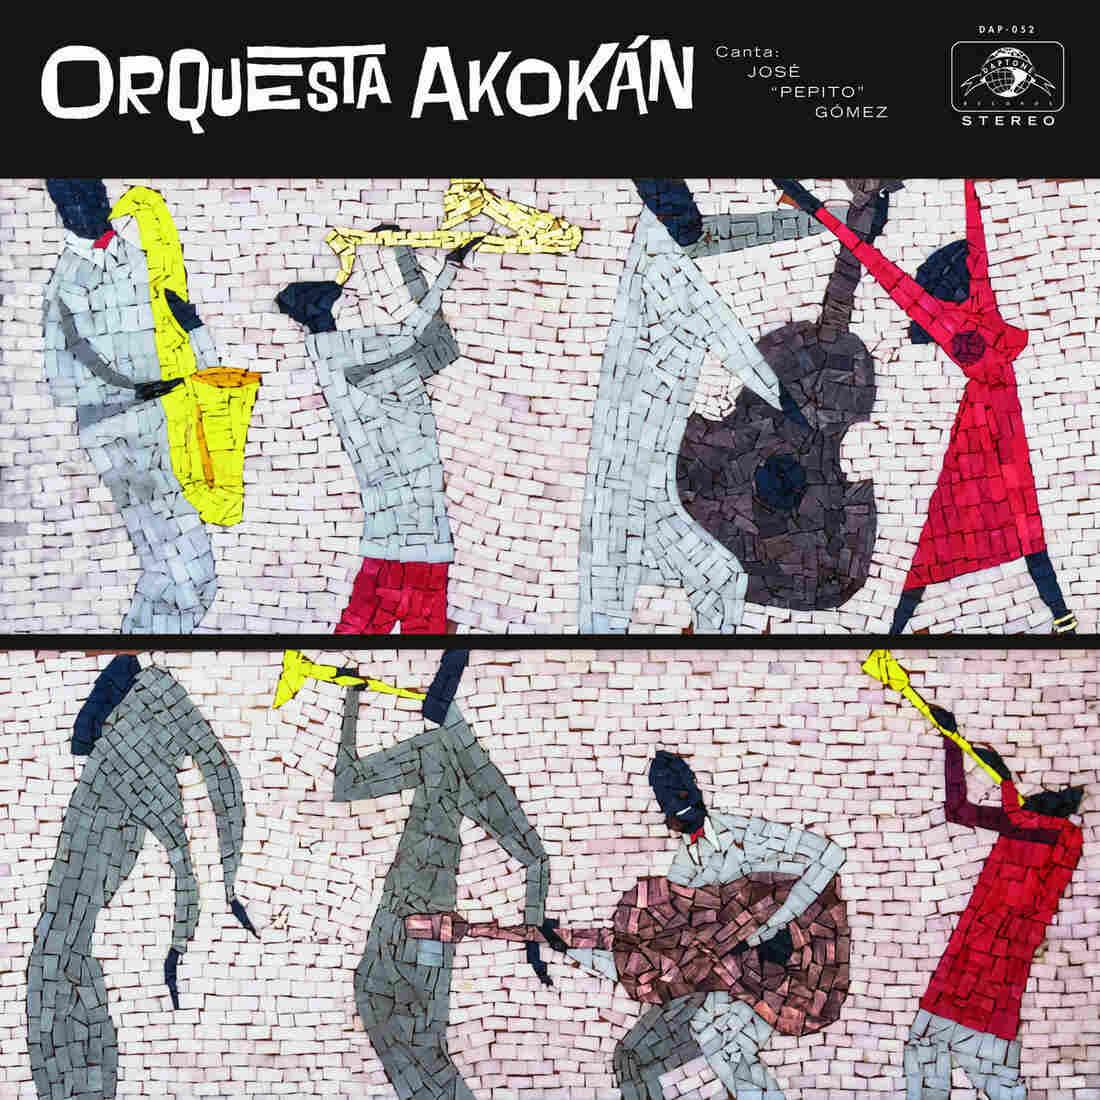 Orquesta Akokán, Orquesta Akokán